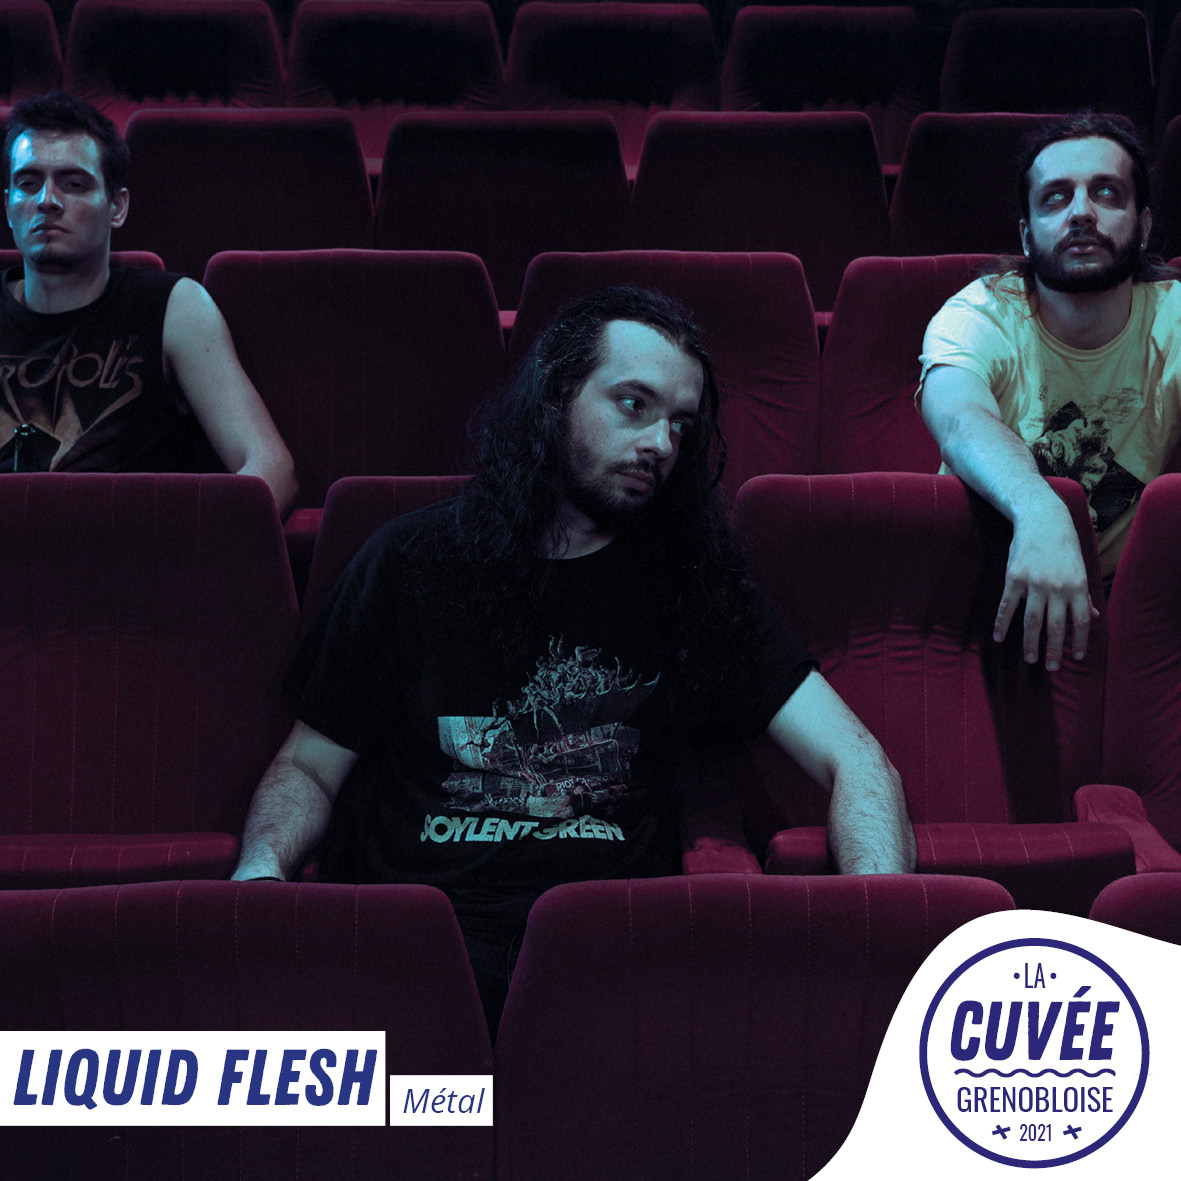 Liquid Flesh